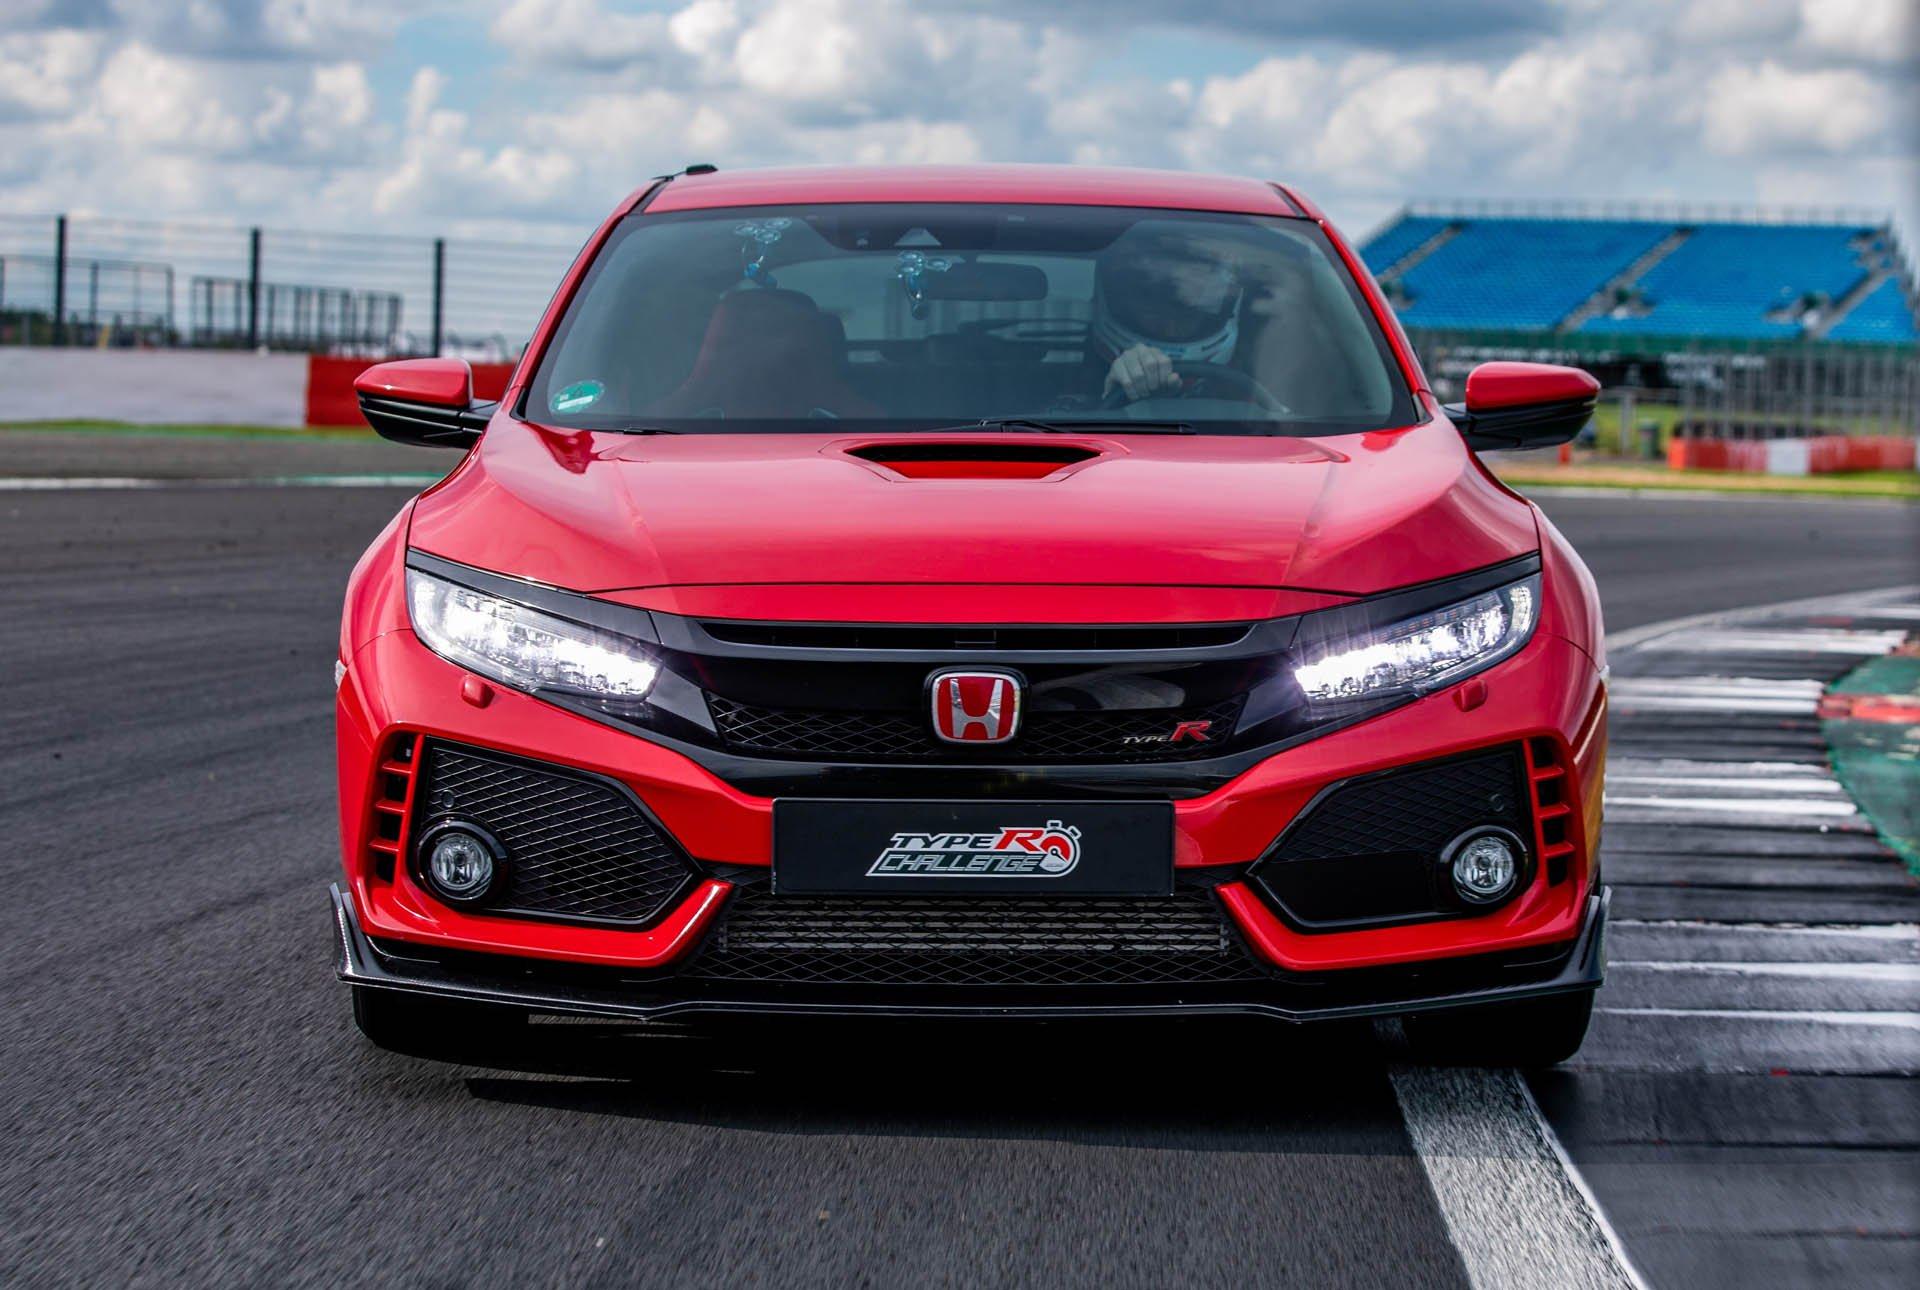 Honda Civic Type R Silverstone Record (3)